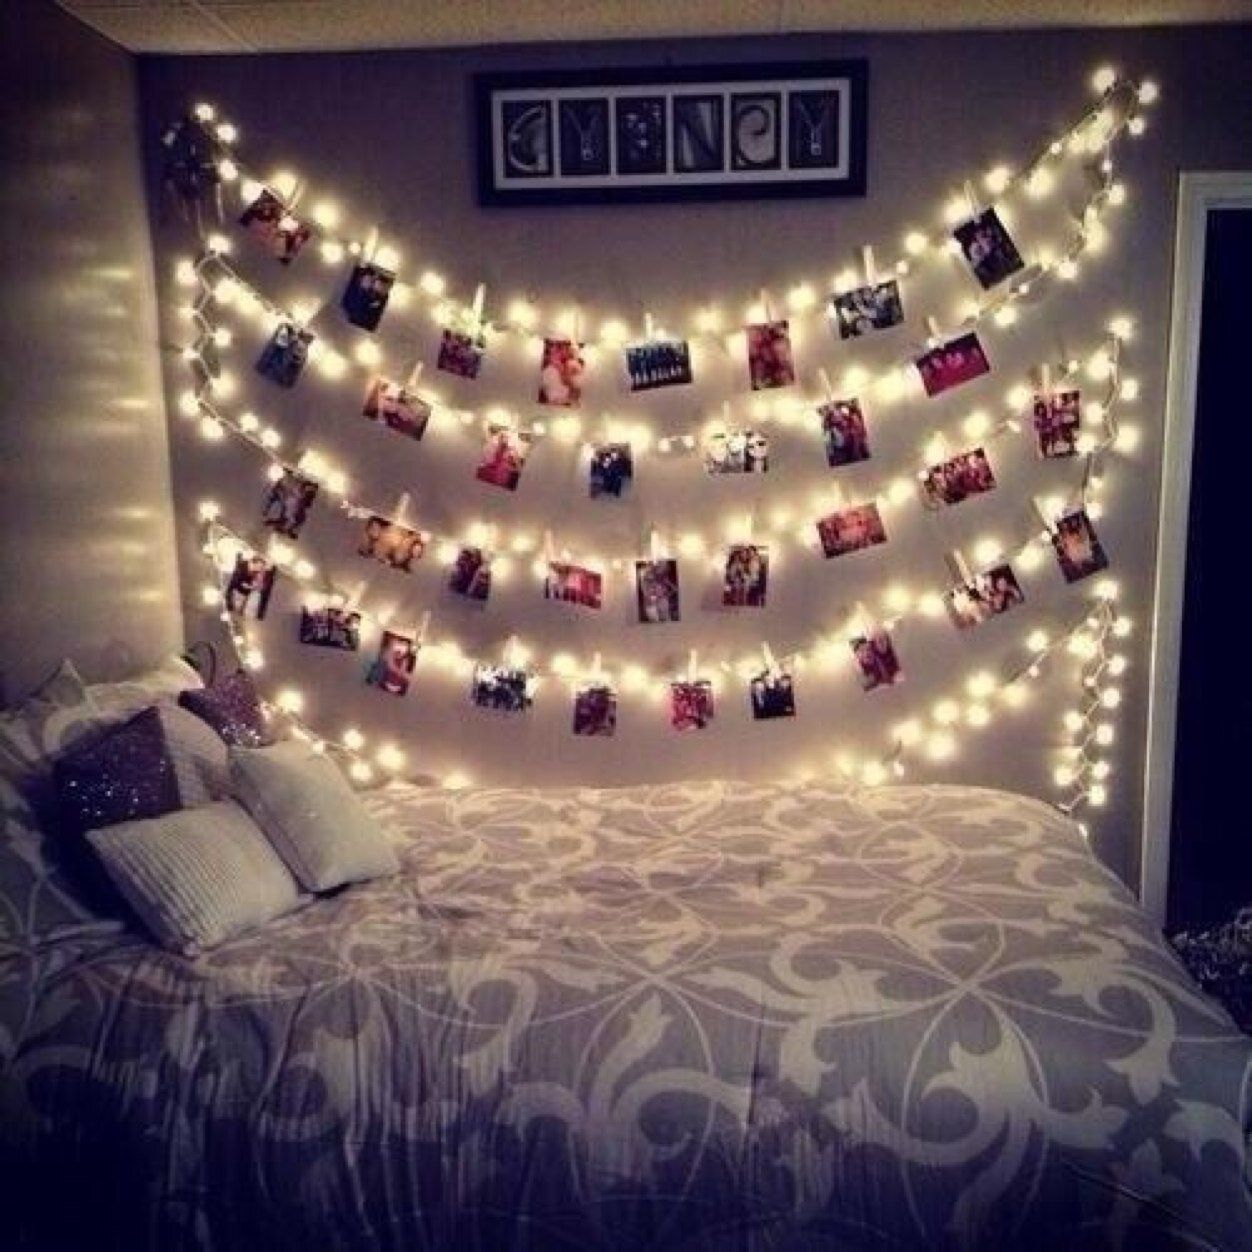 50 Stunning Ideas for a Teen Girl's Bedroom | Pinterest | Teen